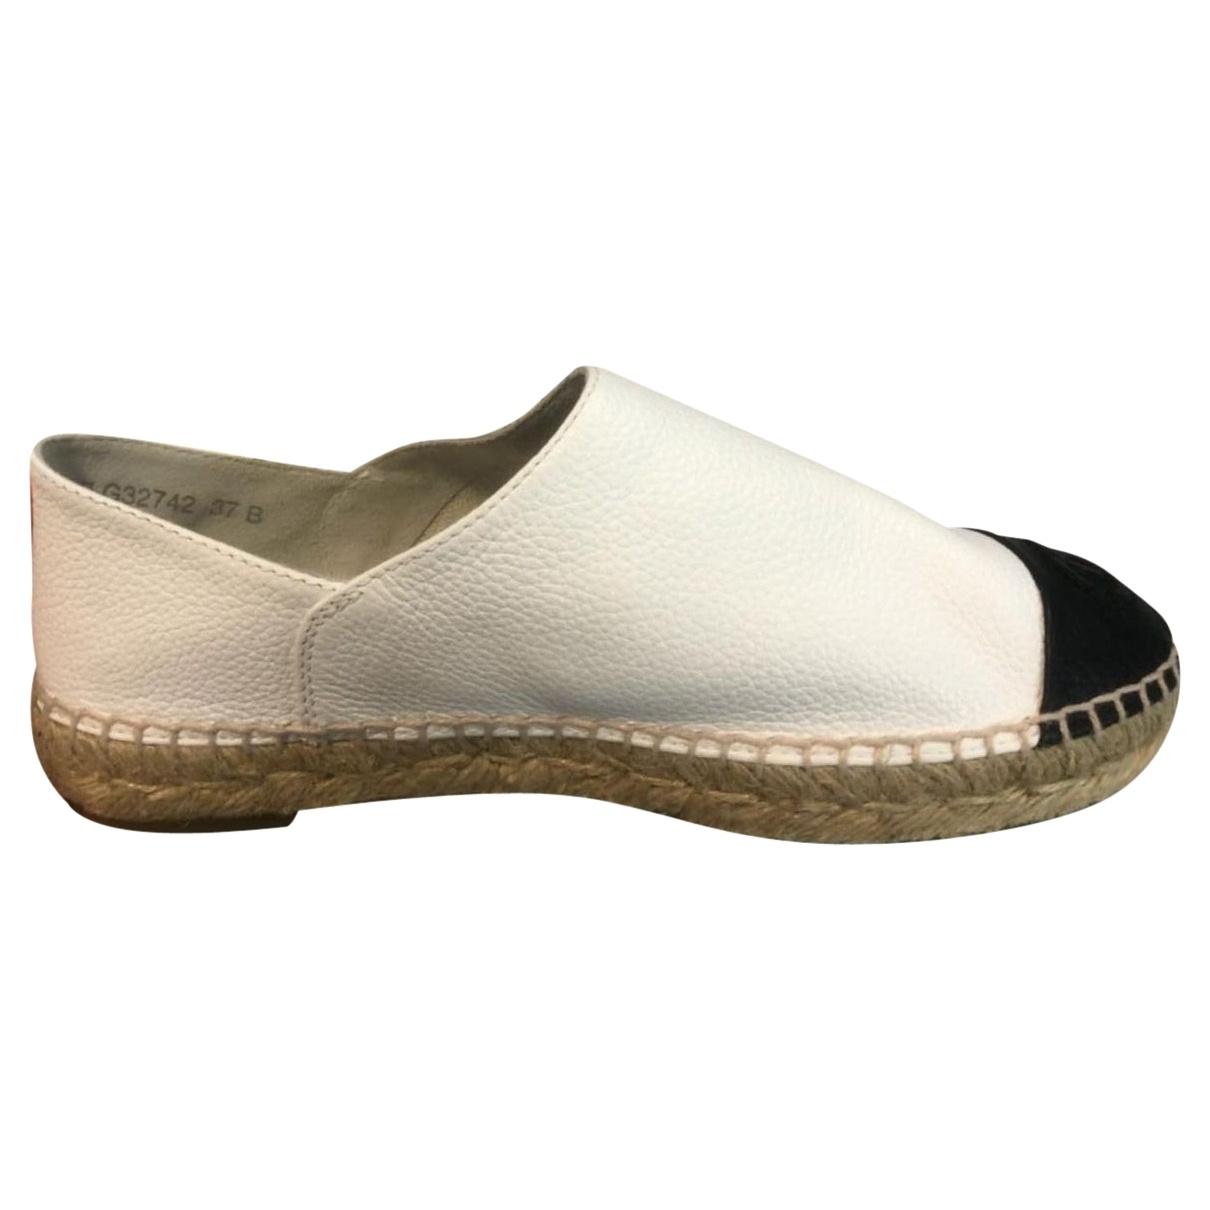 Chanel \N White Leather Espadrilles for Women 37 EU